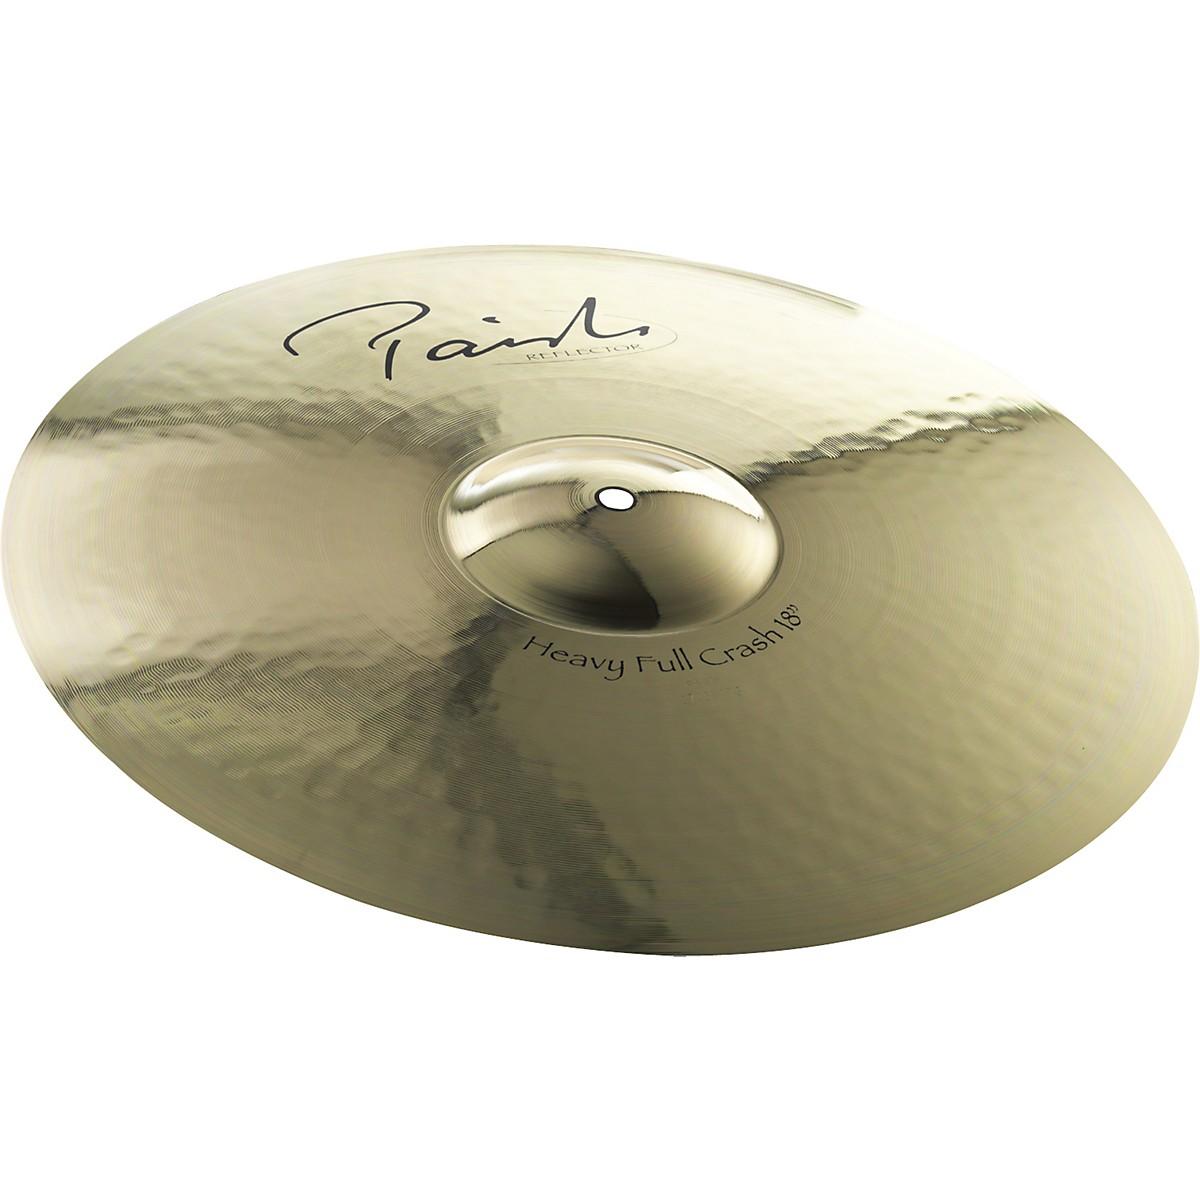 Paiste Signature Reflector Heavy Full Crash Cymbal